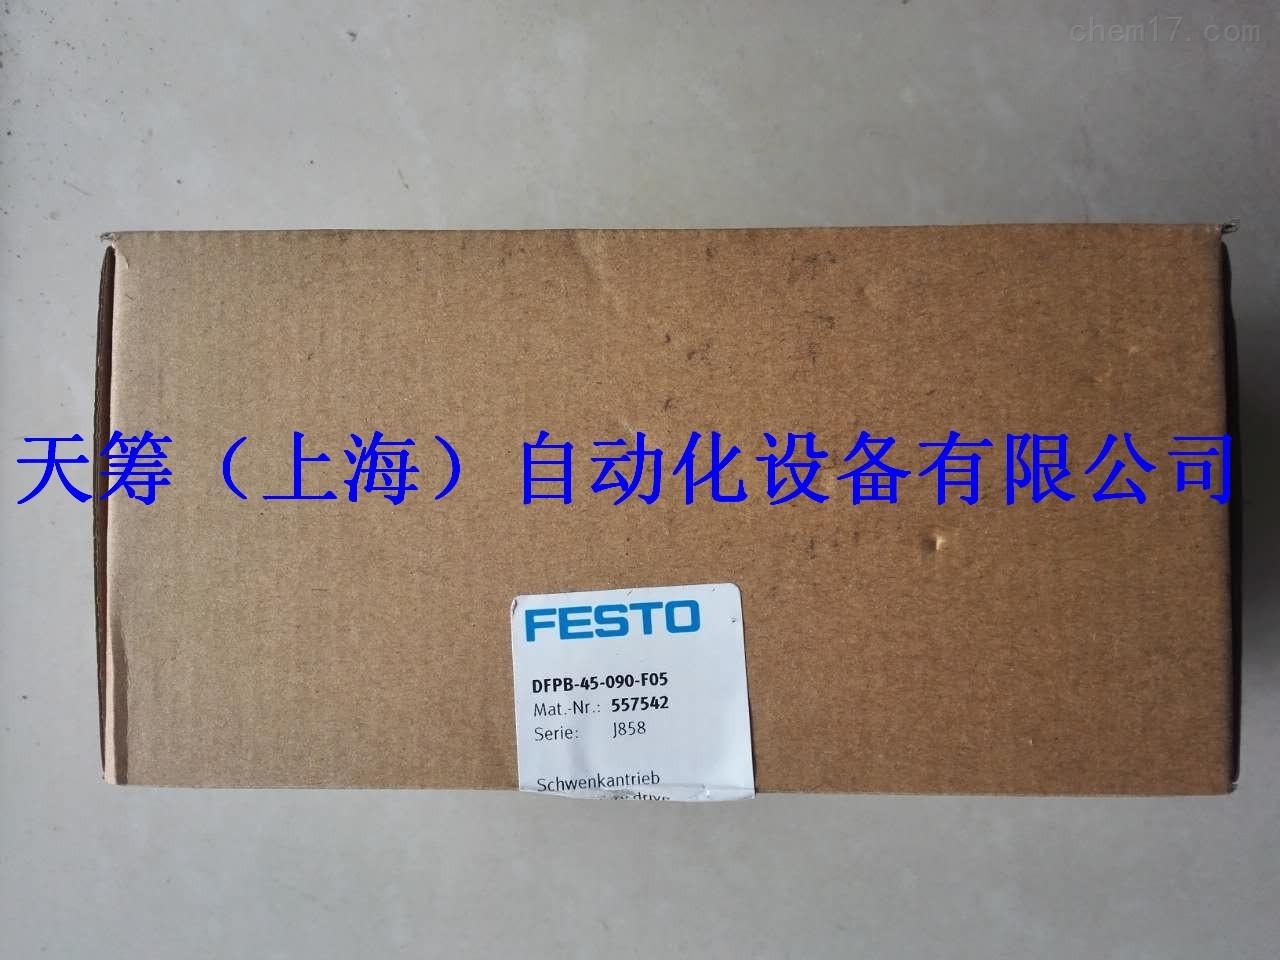 FESTO双作用摆动驱动器DFPB-45-090-F05